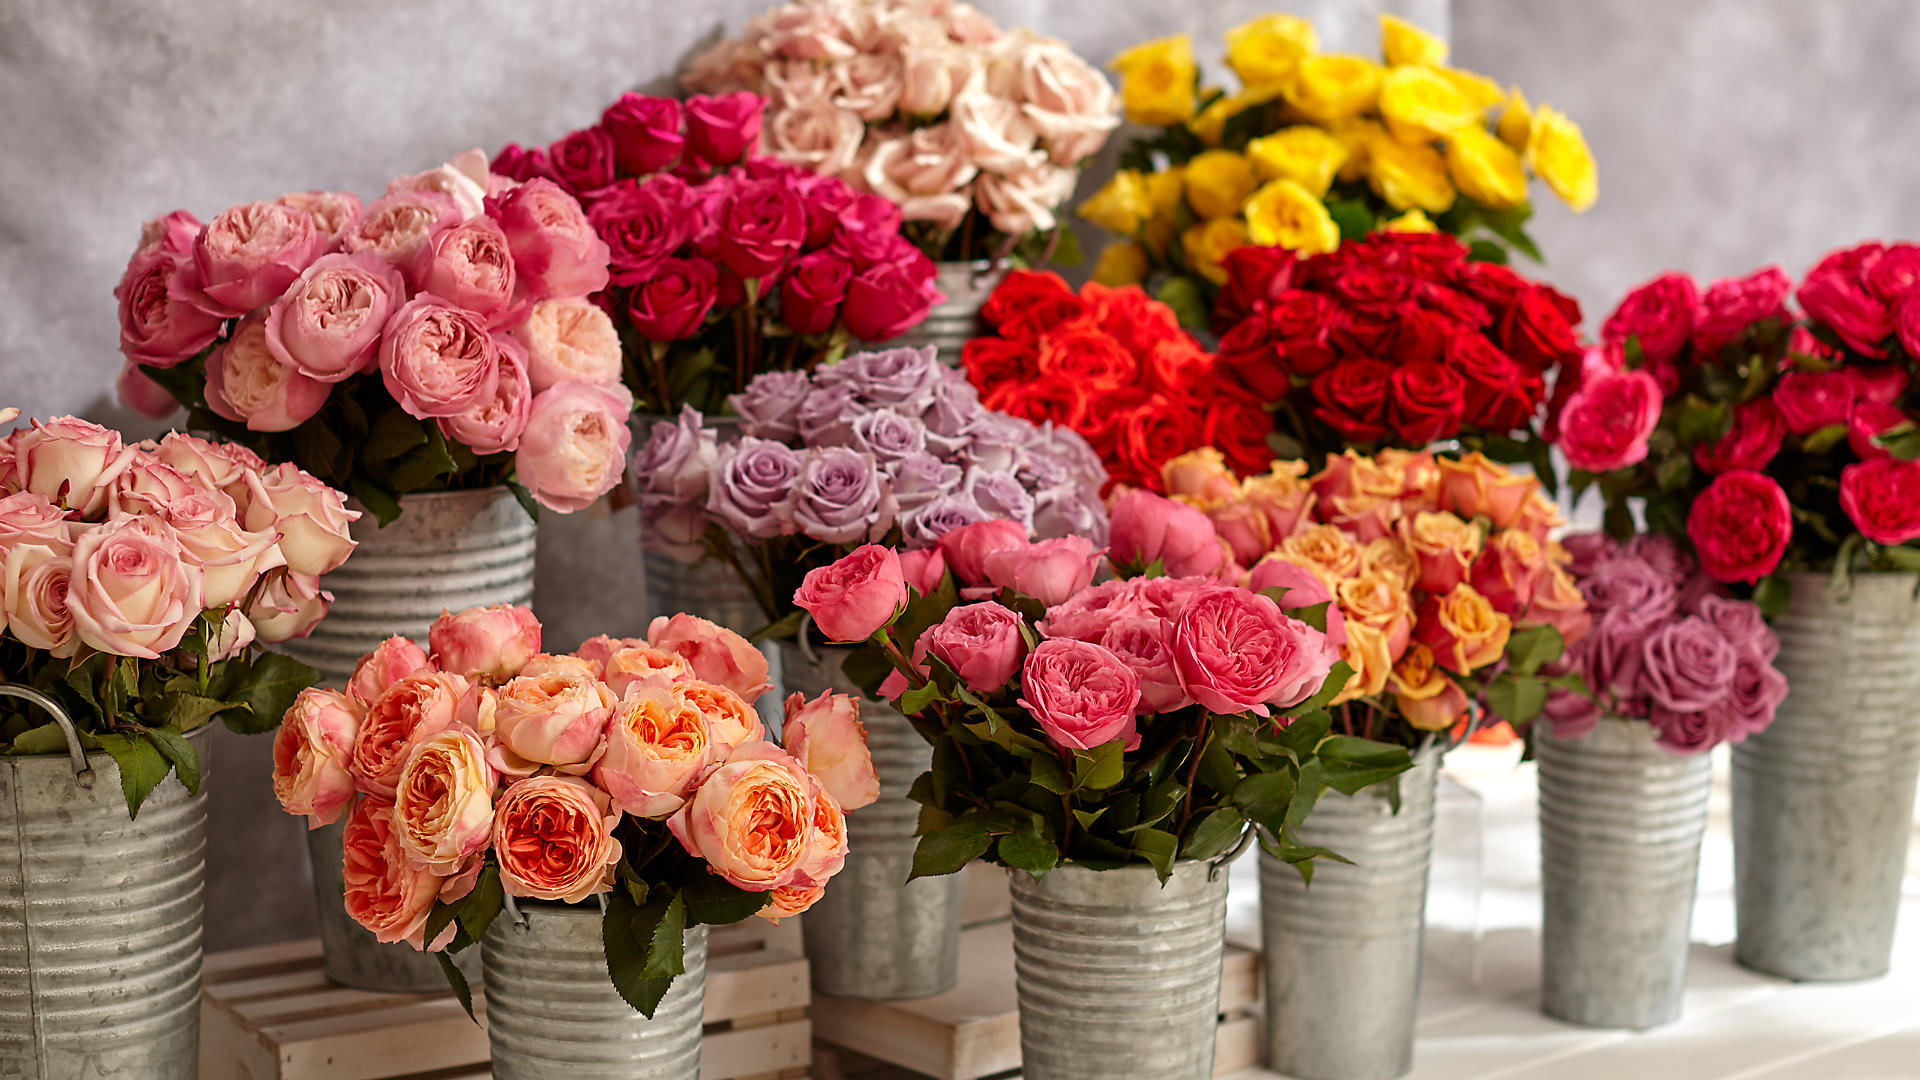 Flowers Online Flower Delivery Send Flowers Proflowers